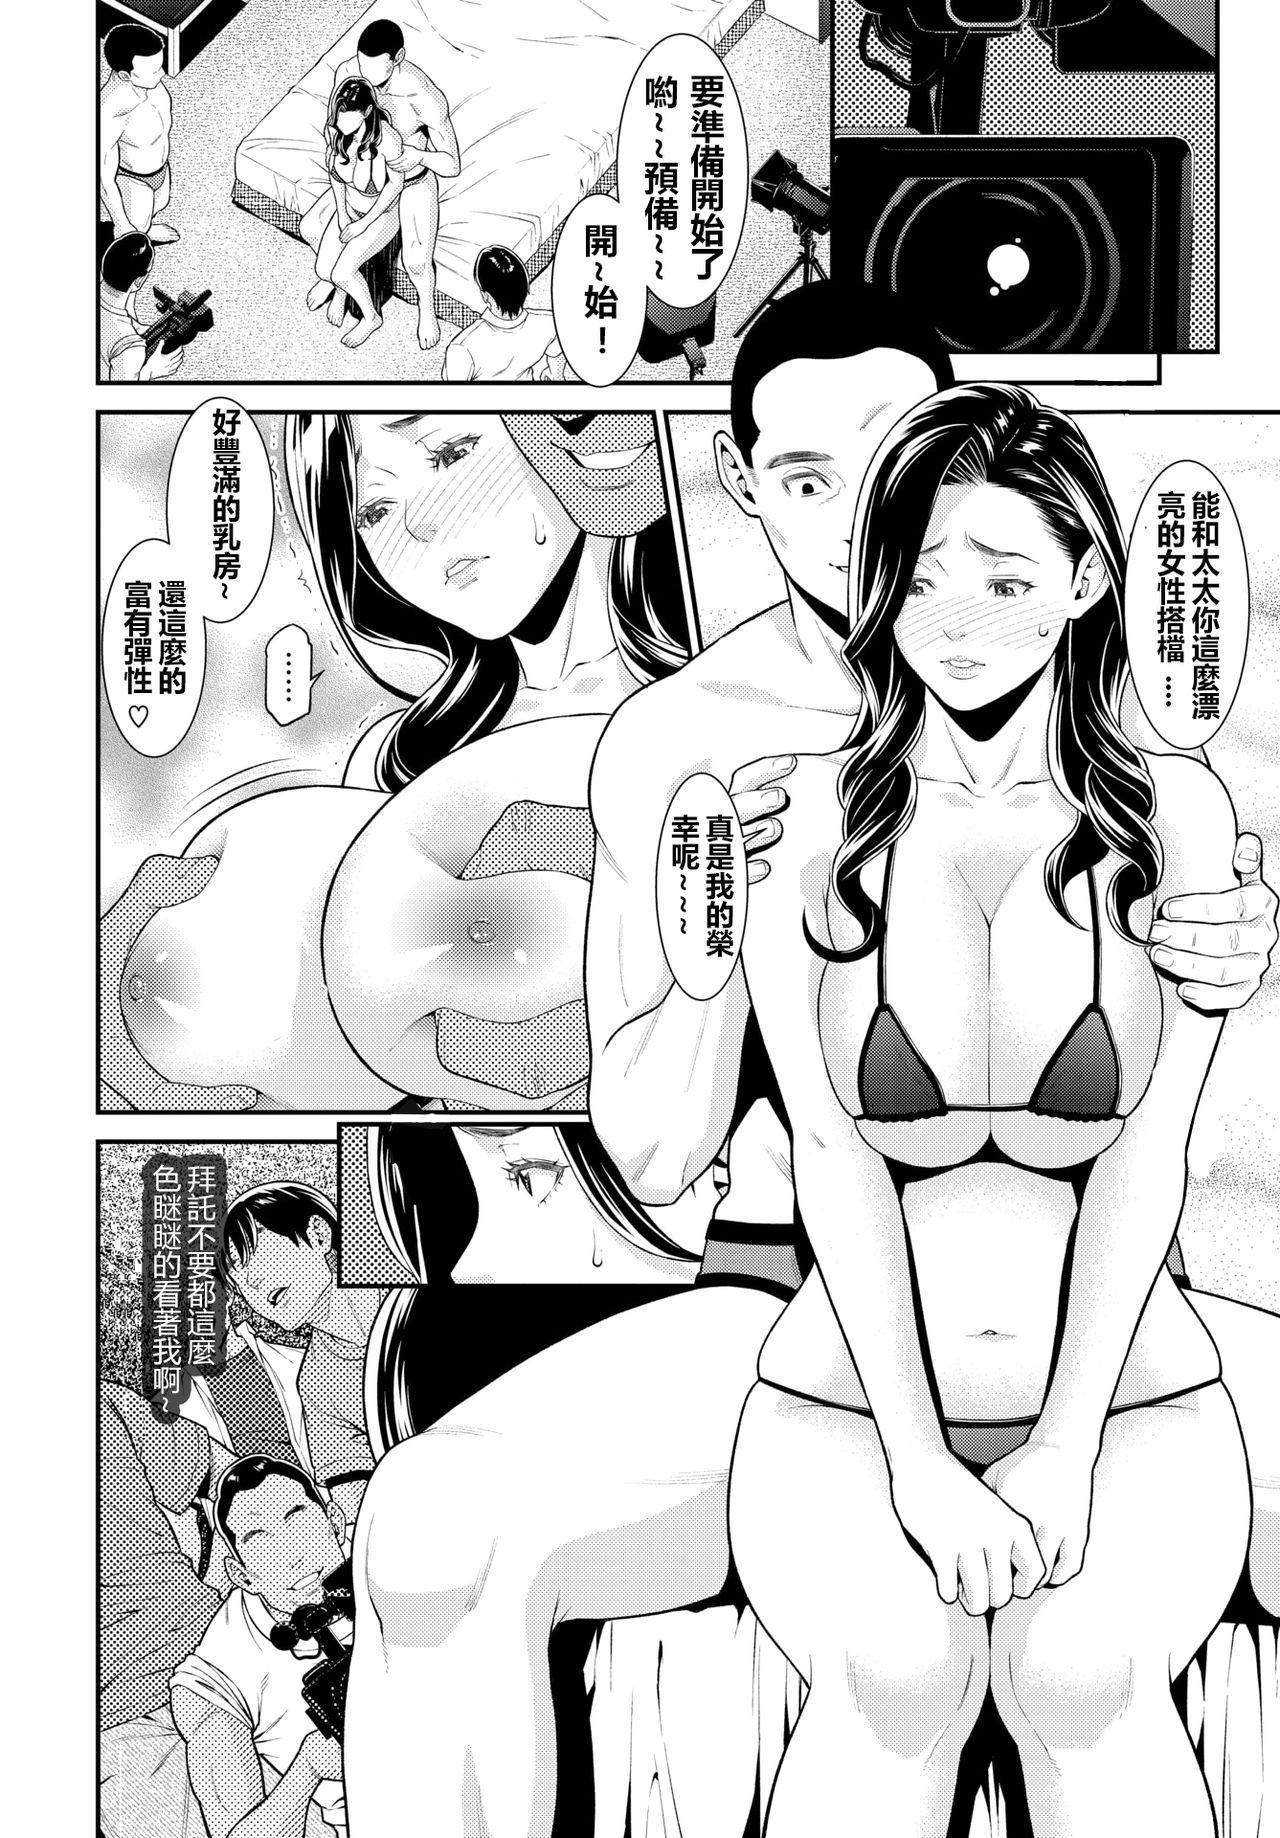 [Syuuen] Secret Wife  1-6 [Chinese][鼠灣漢化](210206最新修复完整版)【極品人妻NTR】 6